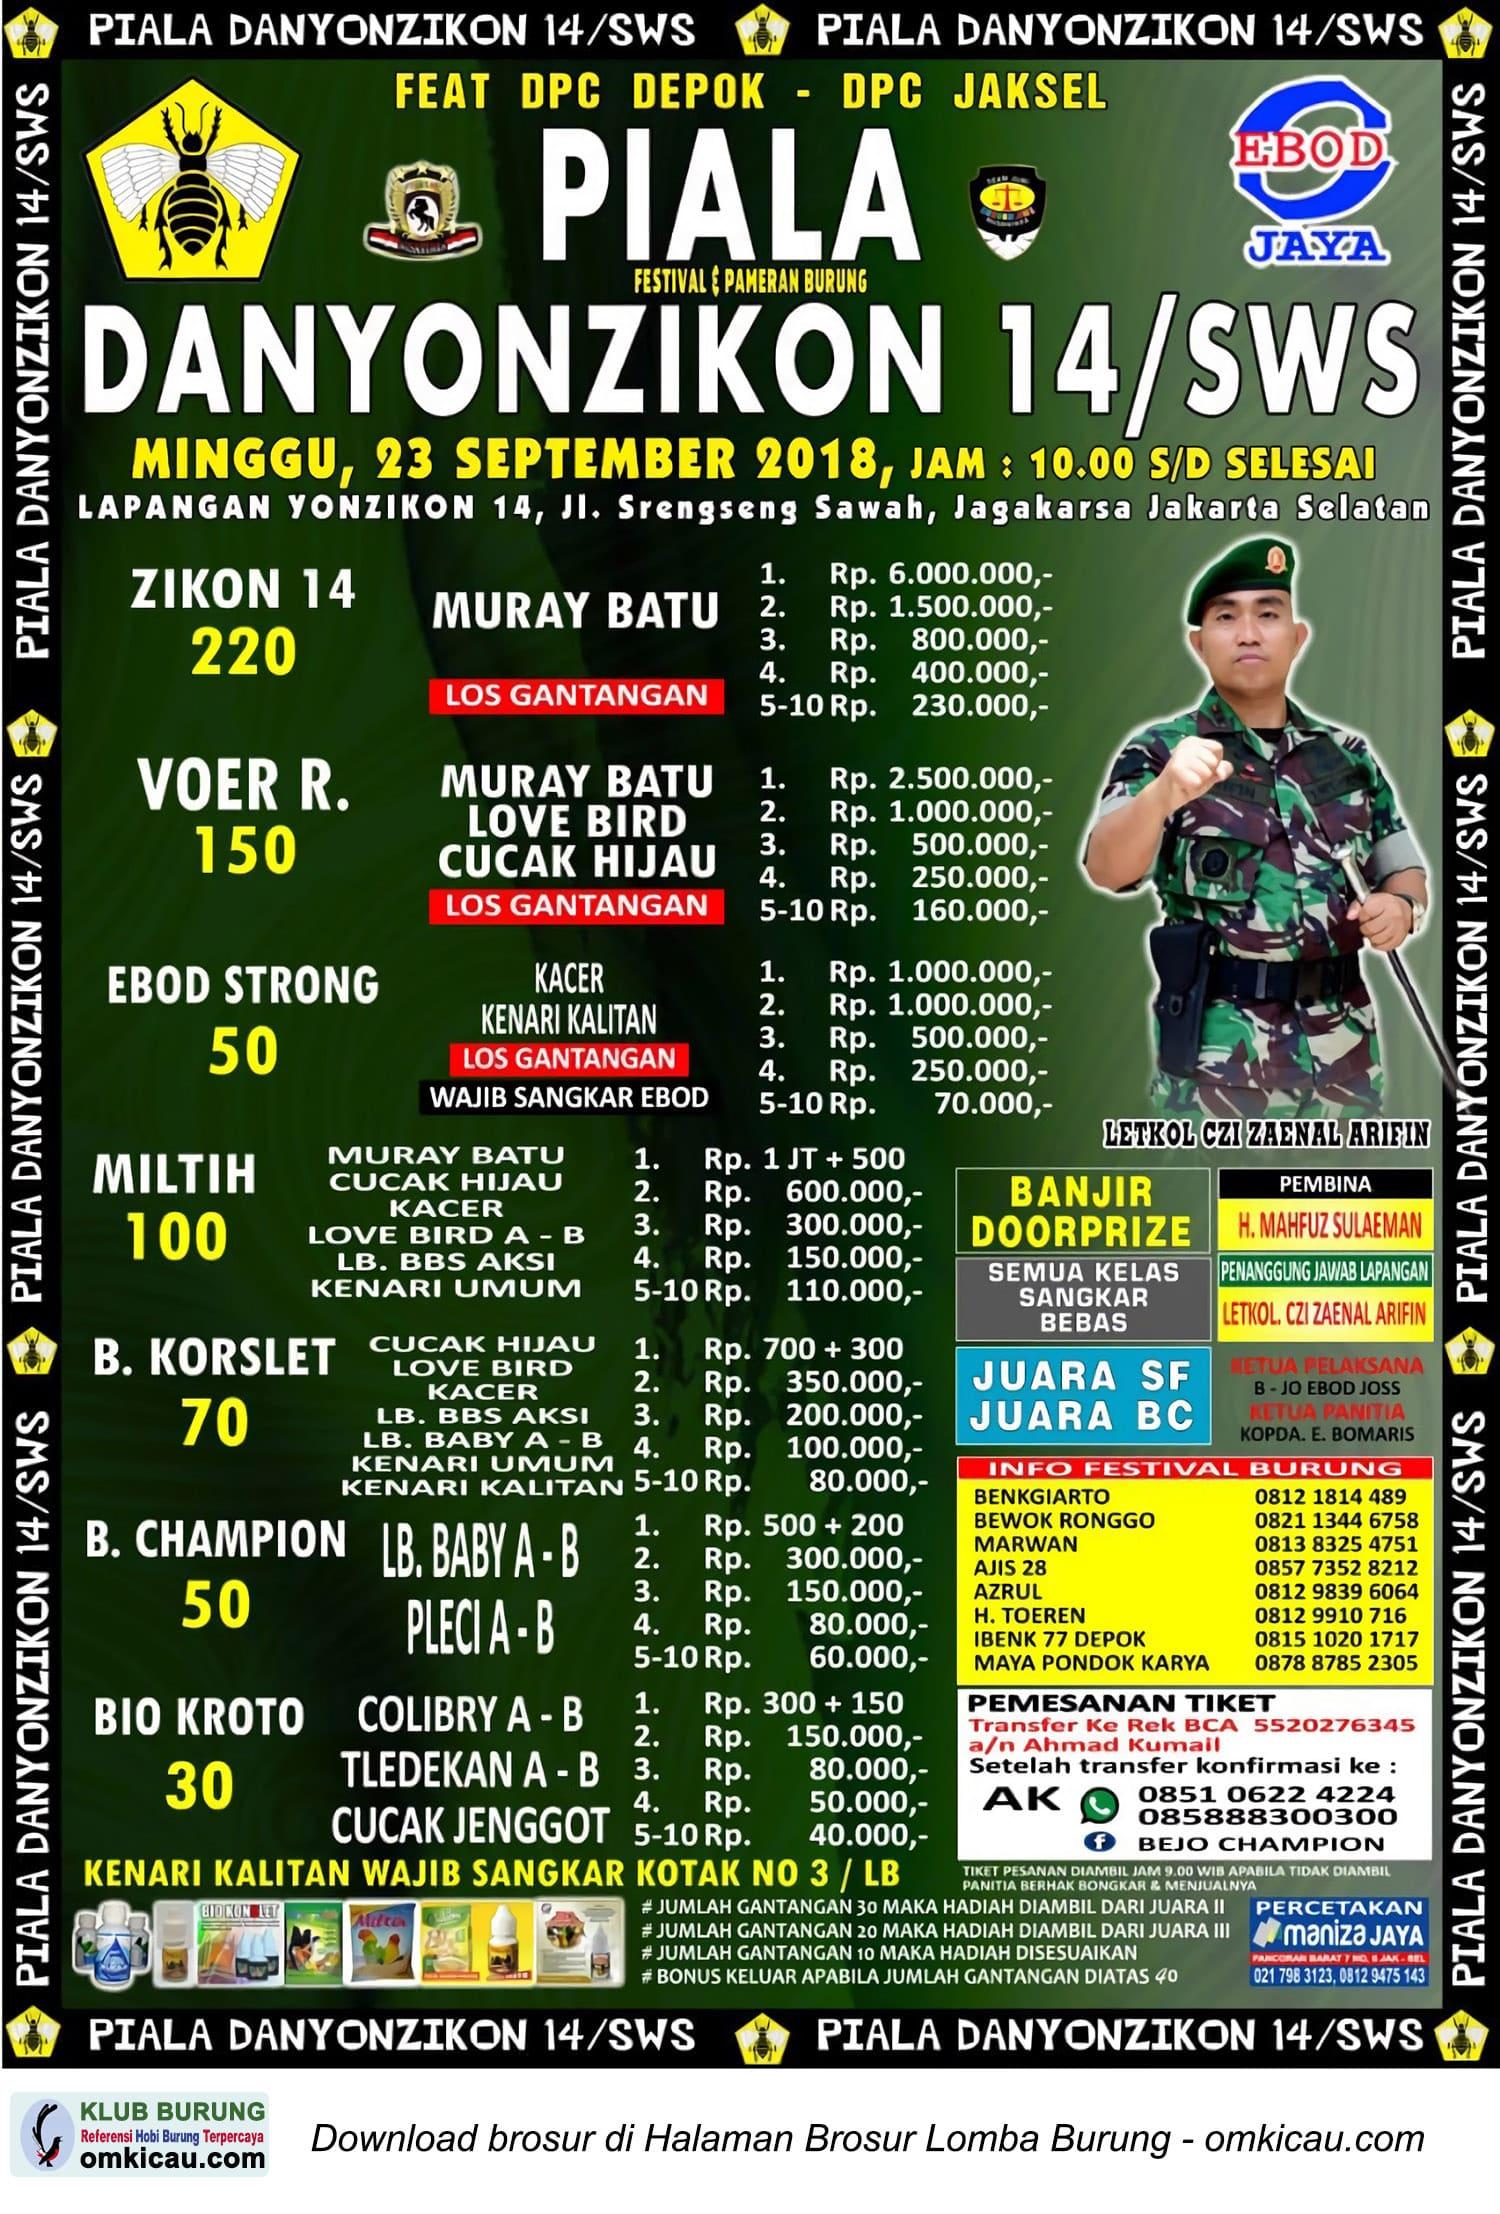 Piala Danyonzikon 14/SWS